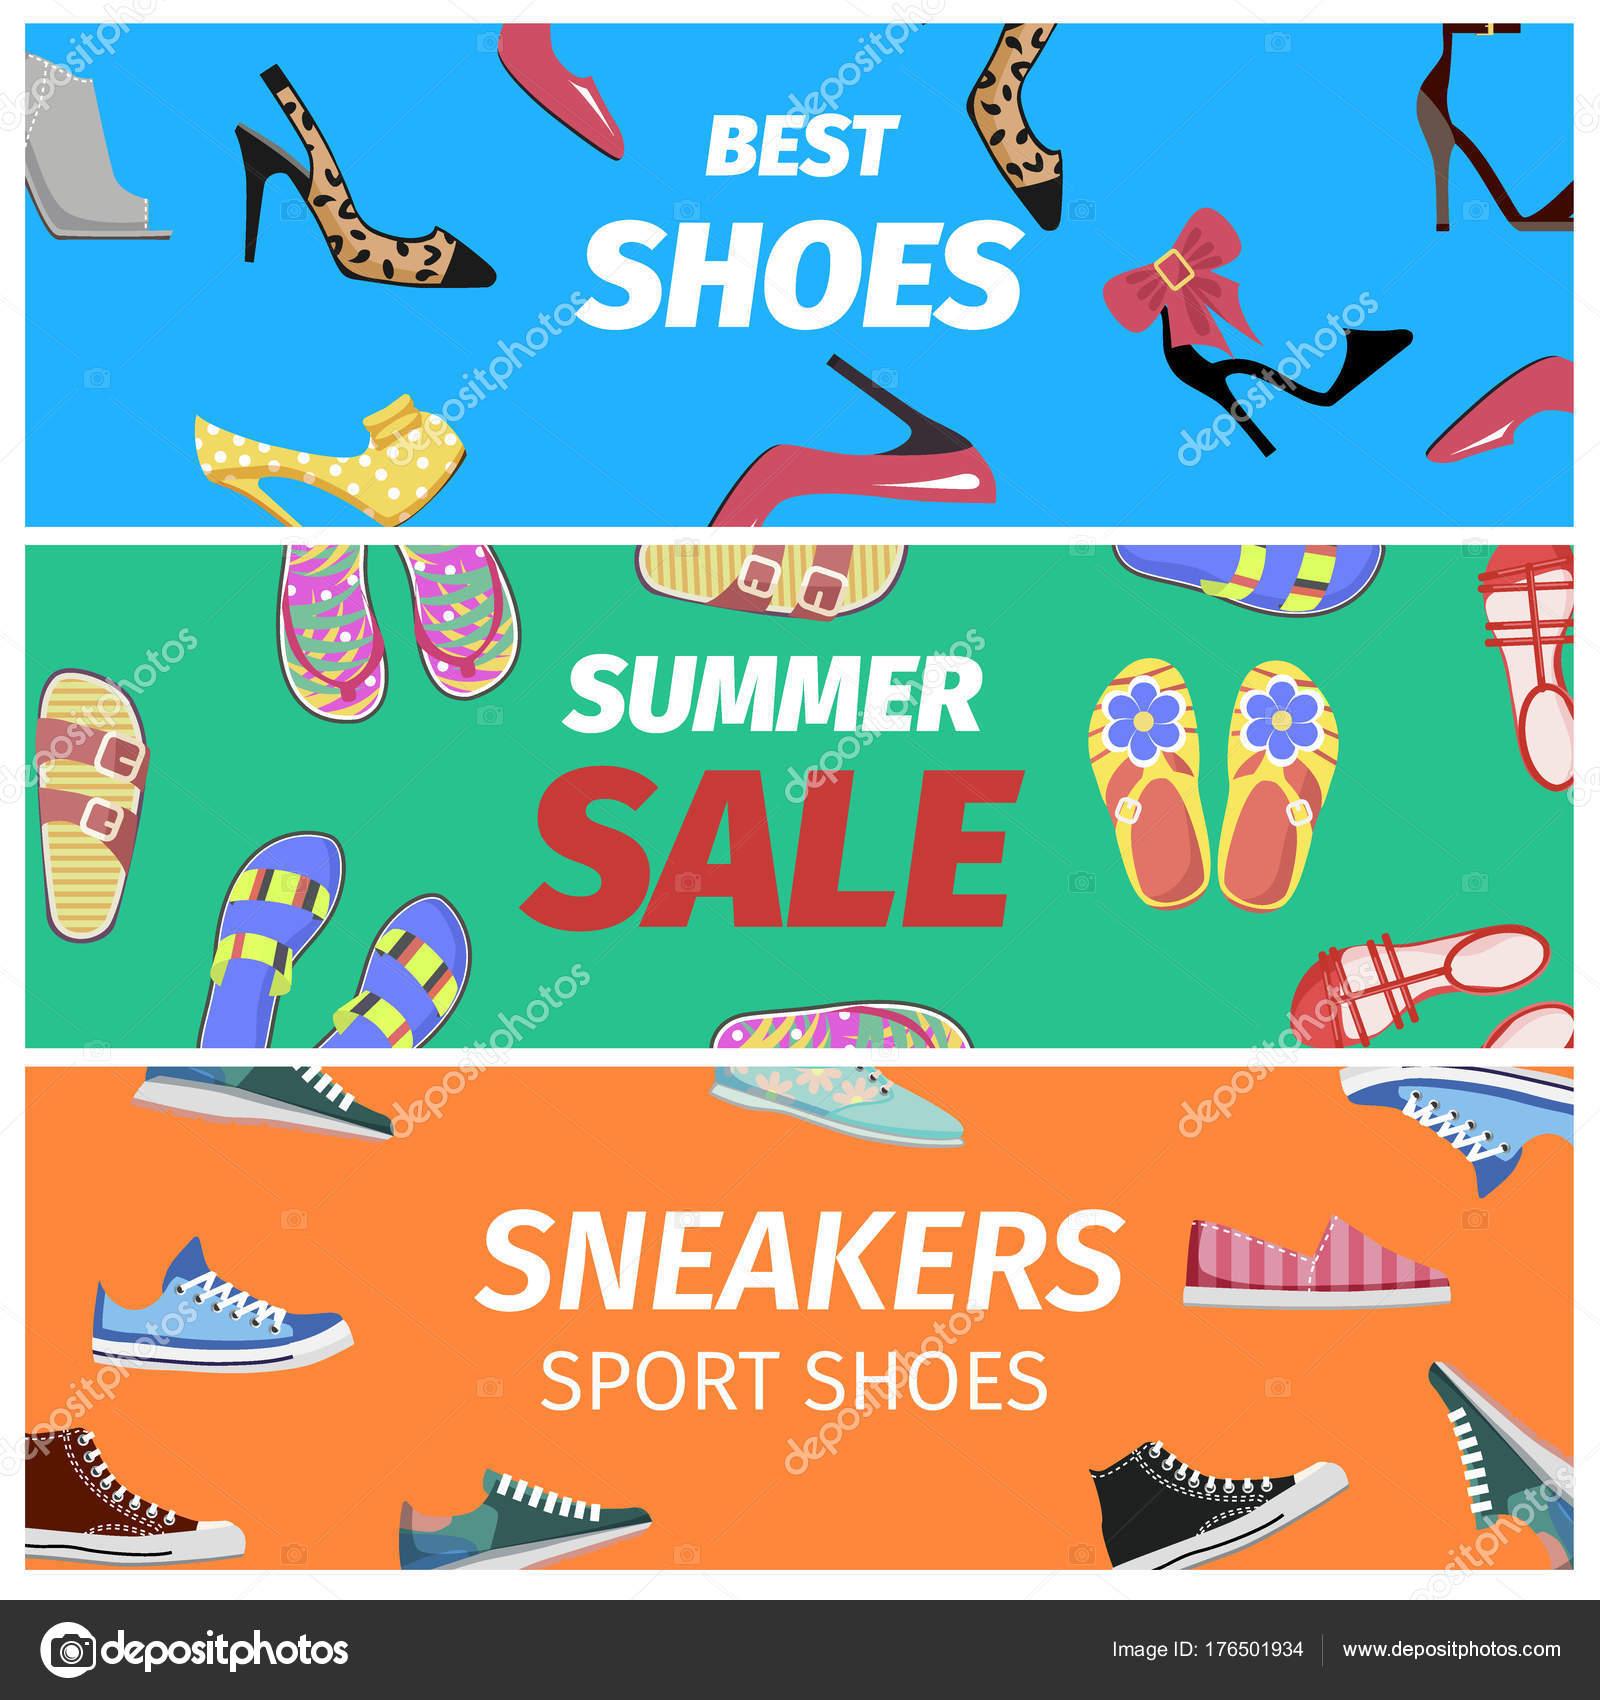 Best Summer Sale of Sneakers Sport